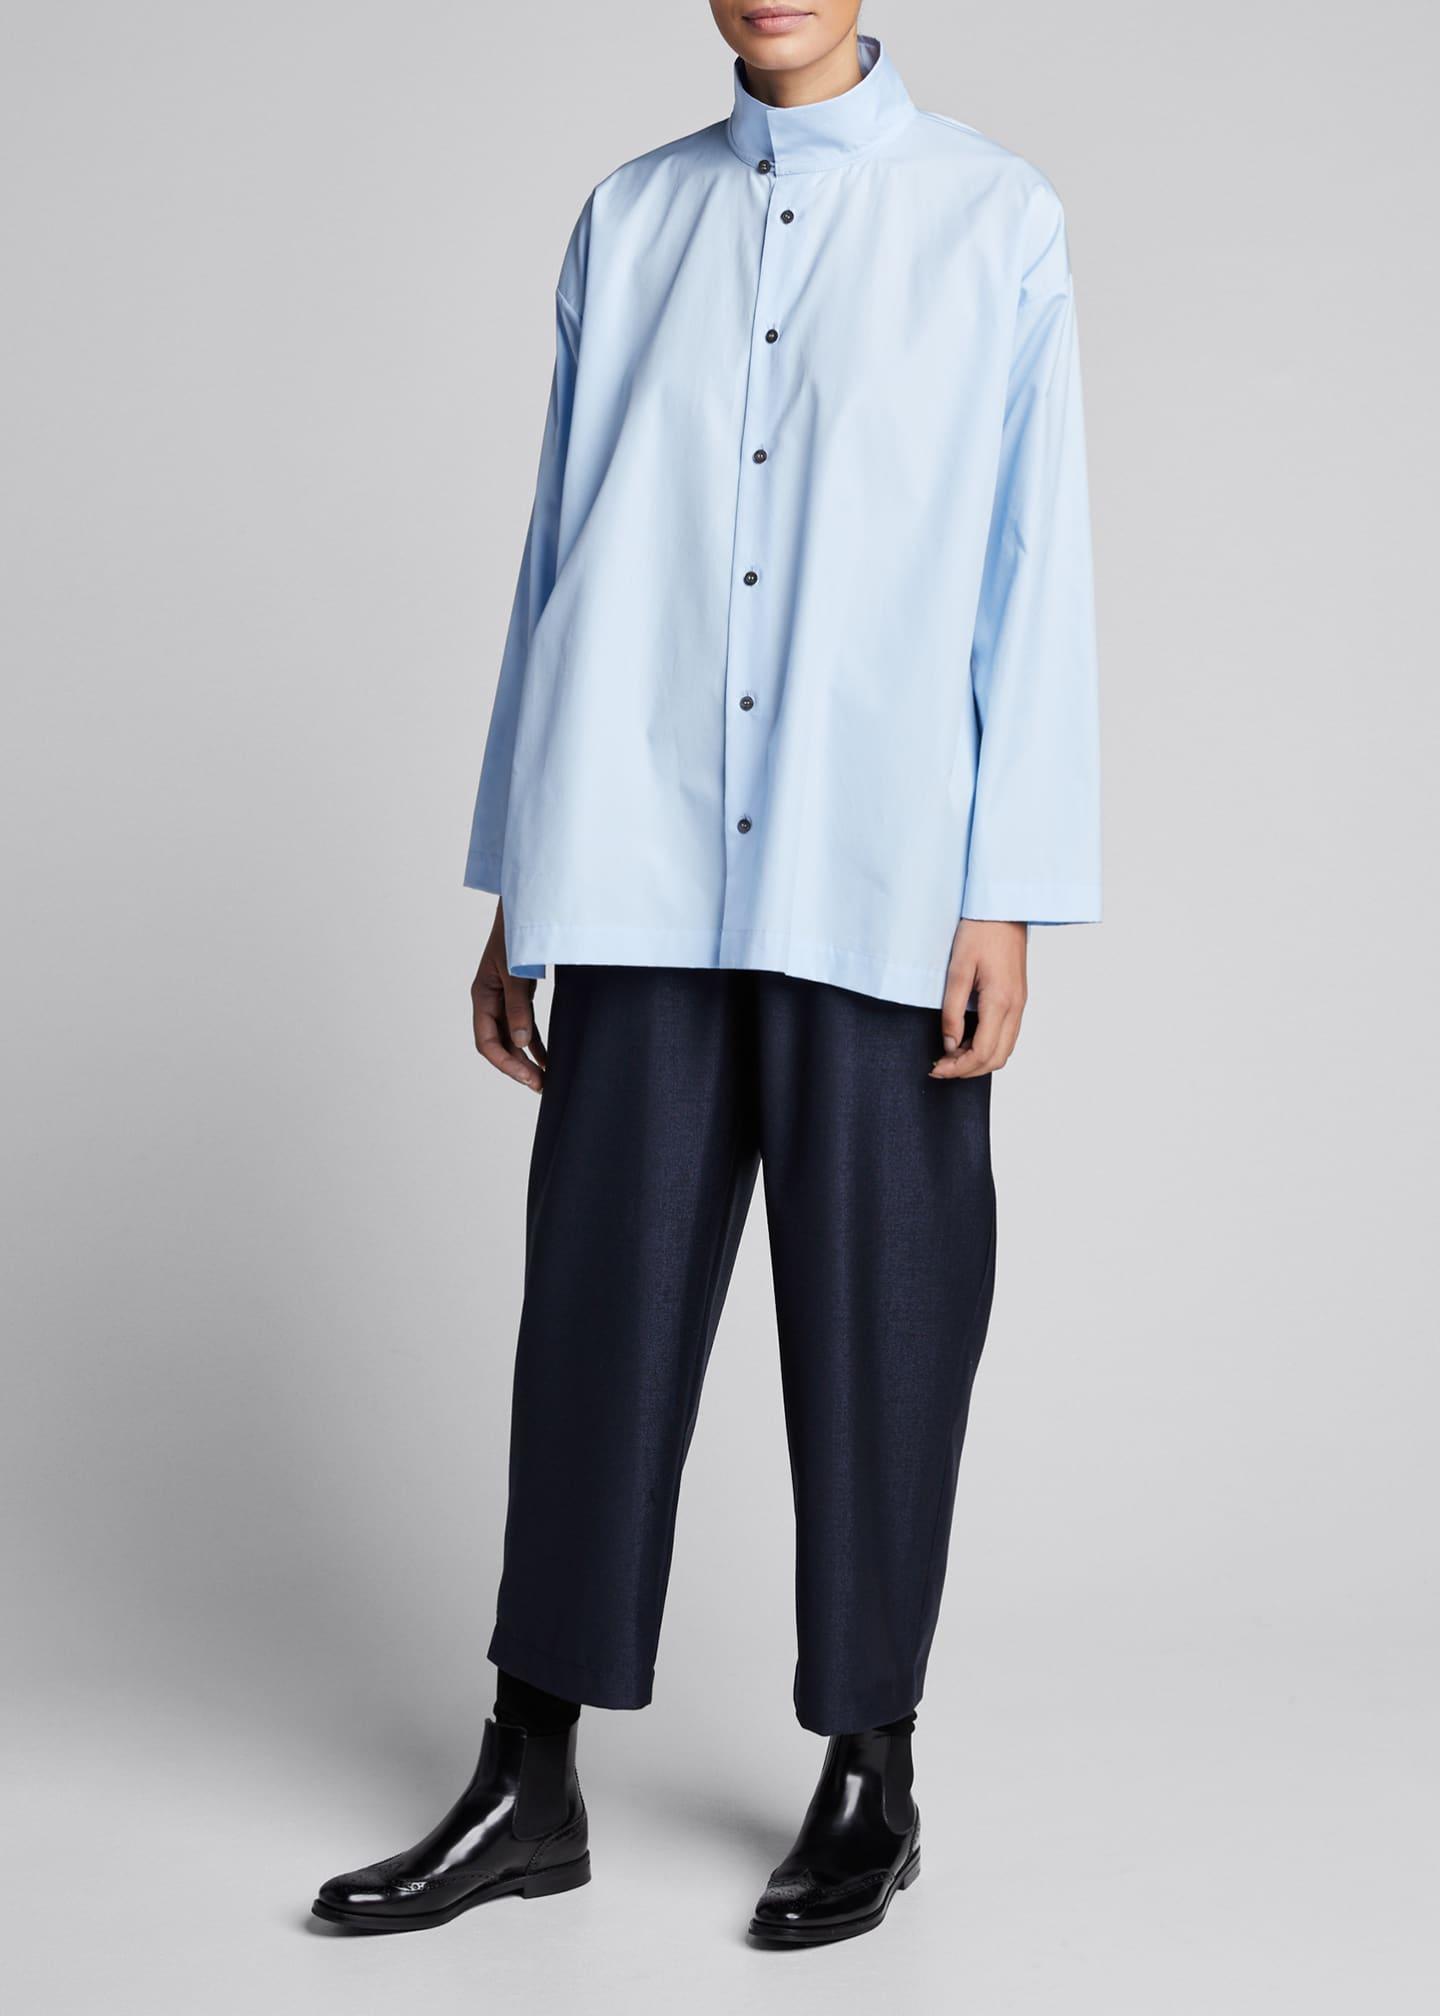 Eskandar Slim A-Line Layered-Collar Blouse